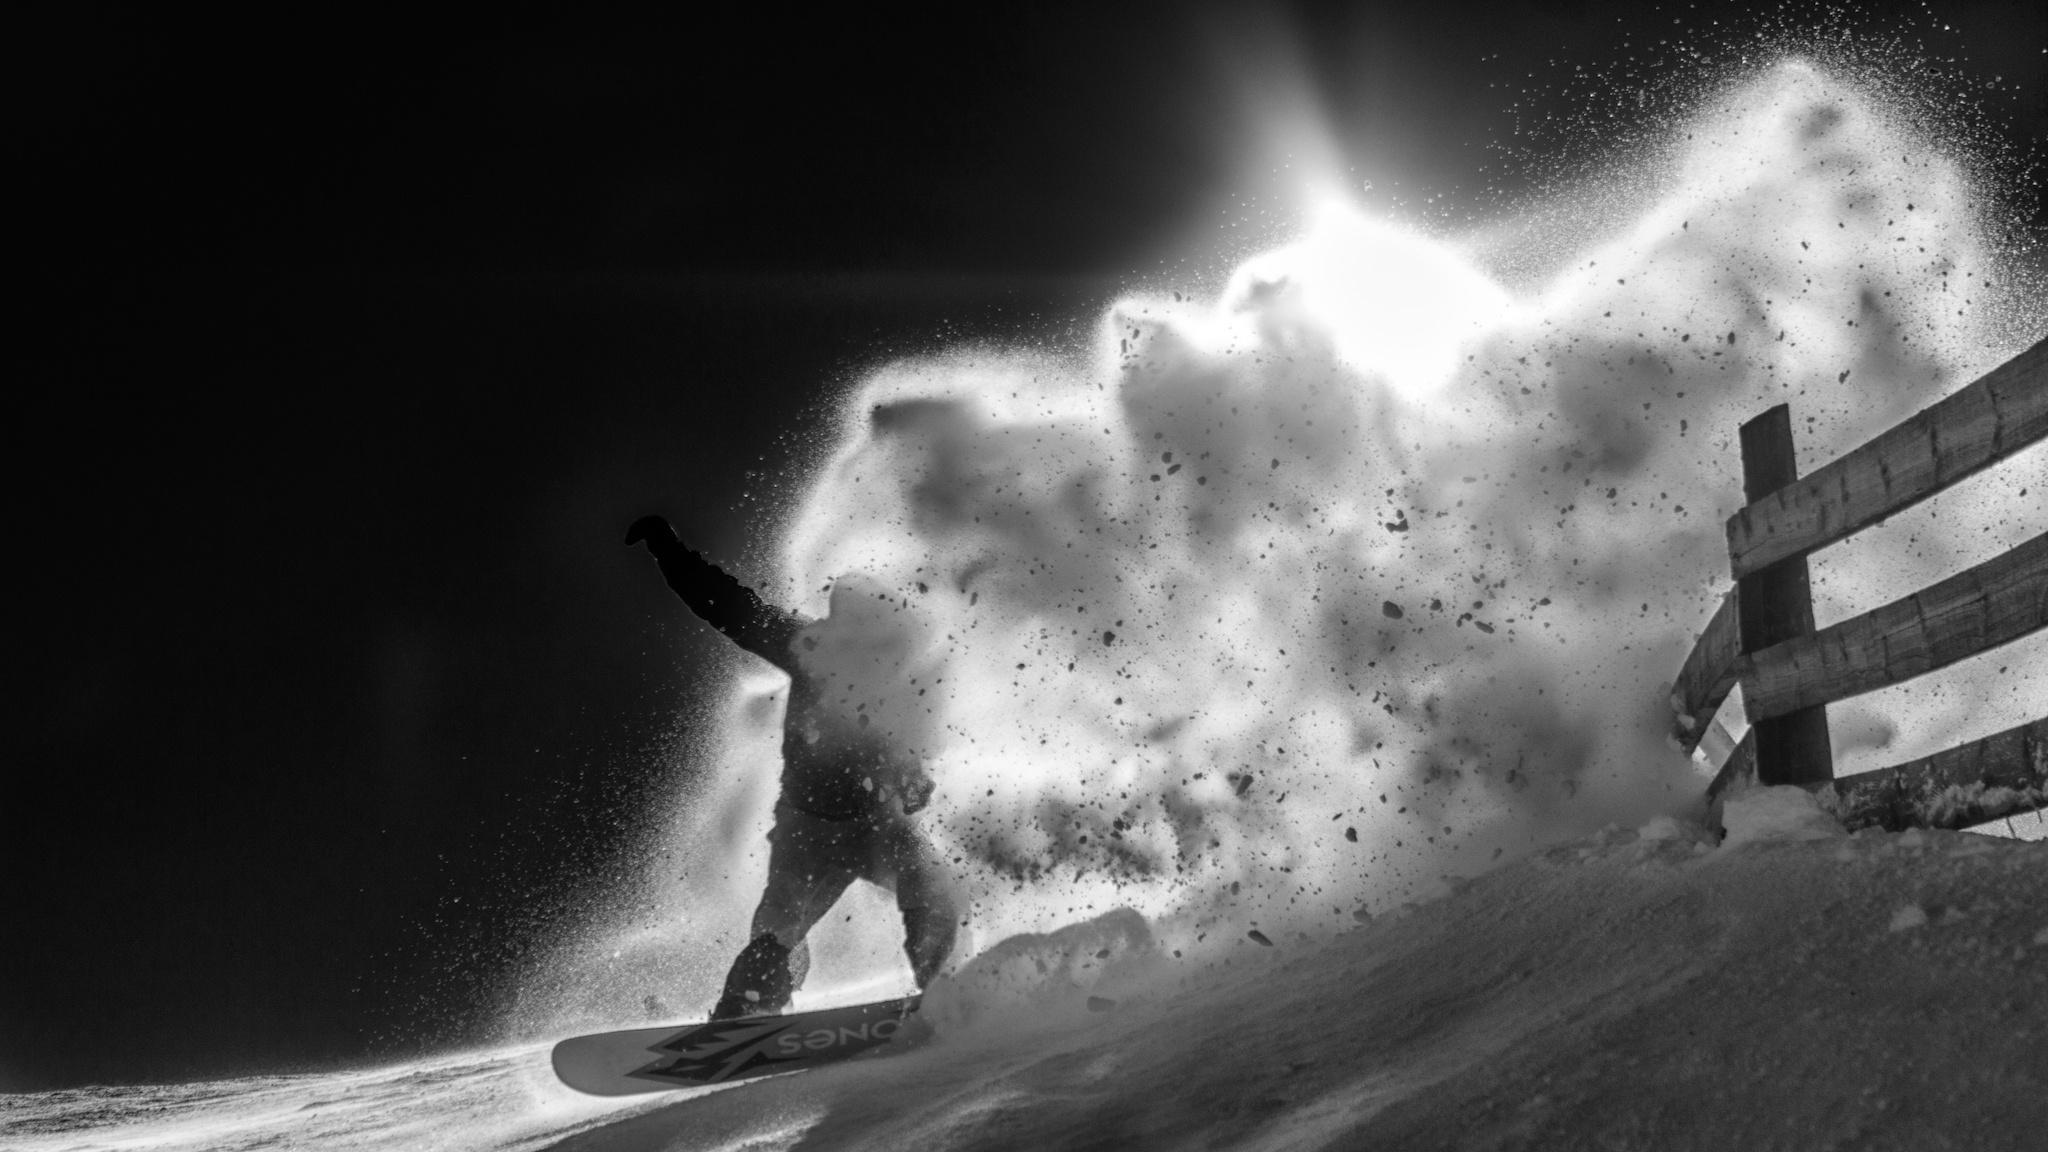 Astun, Ekaitz Isasi - Ski & Snowboard - Fotos del Valle del Aragón, Mikel Besga